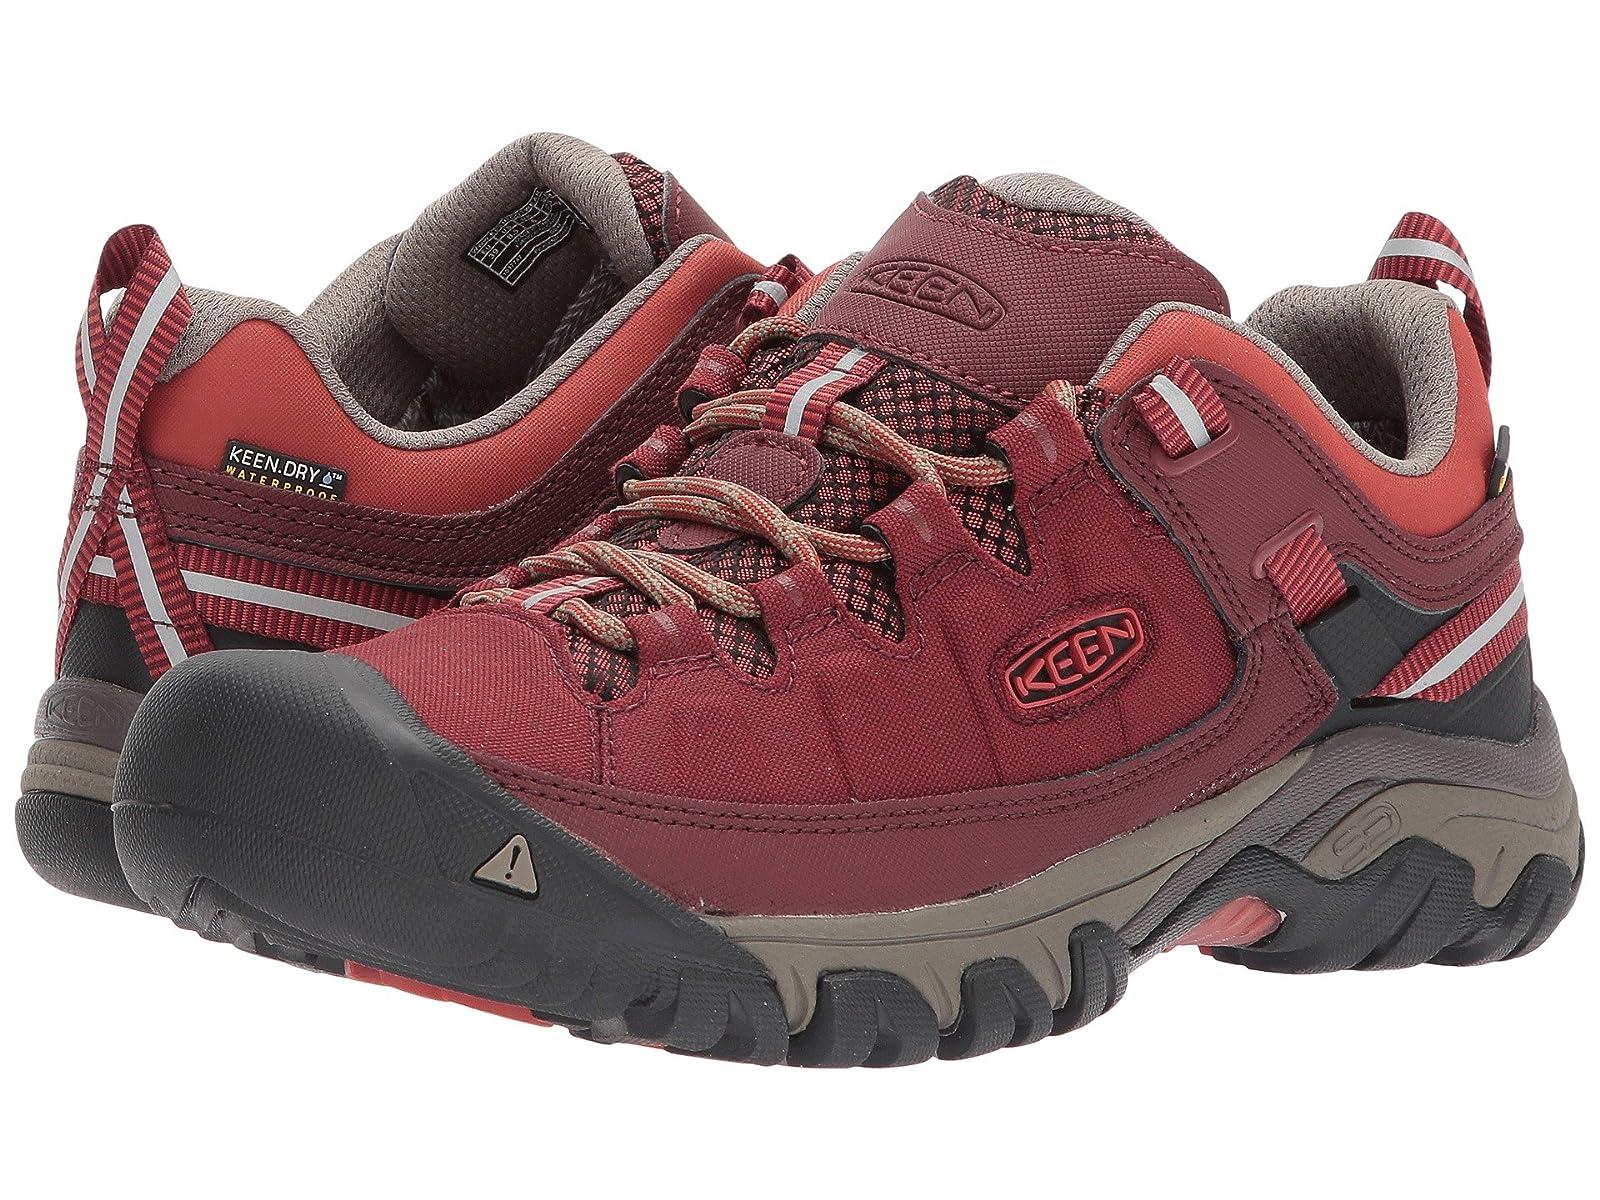 Keen Targhee Exp WPCheap and distinctive eye-catching shoes